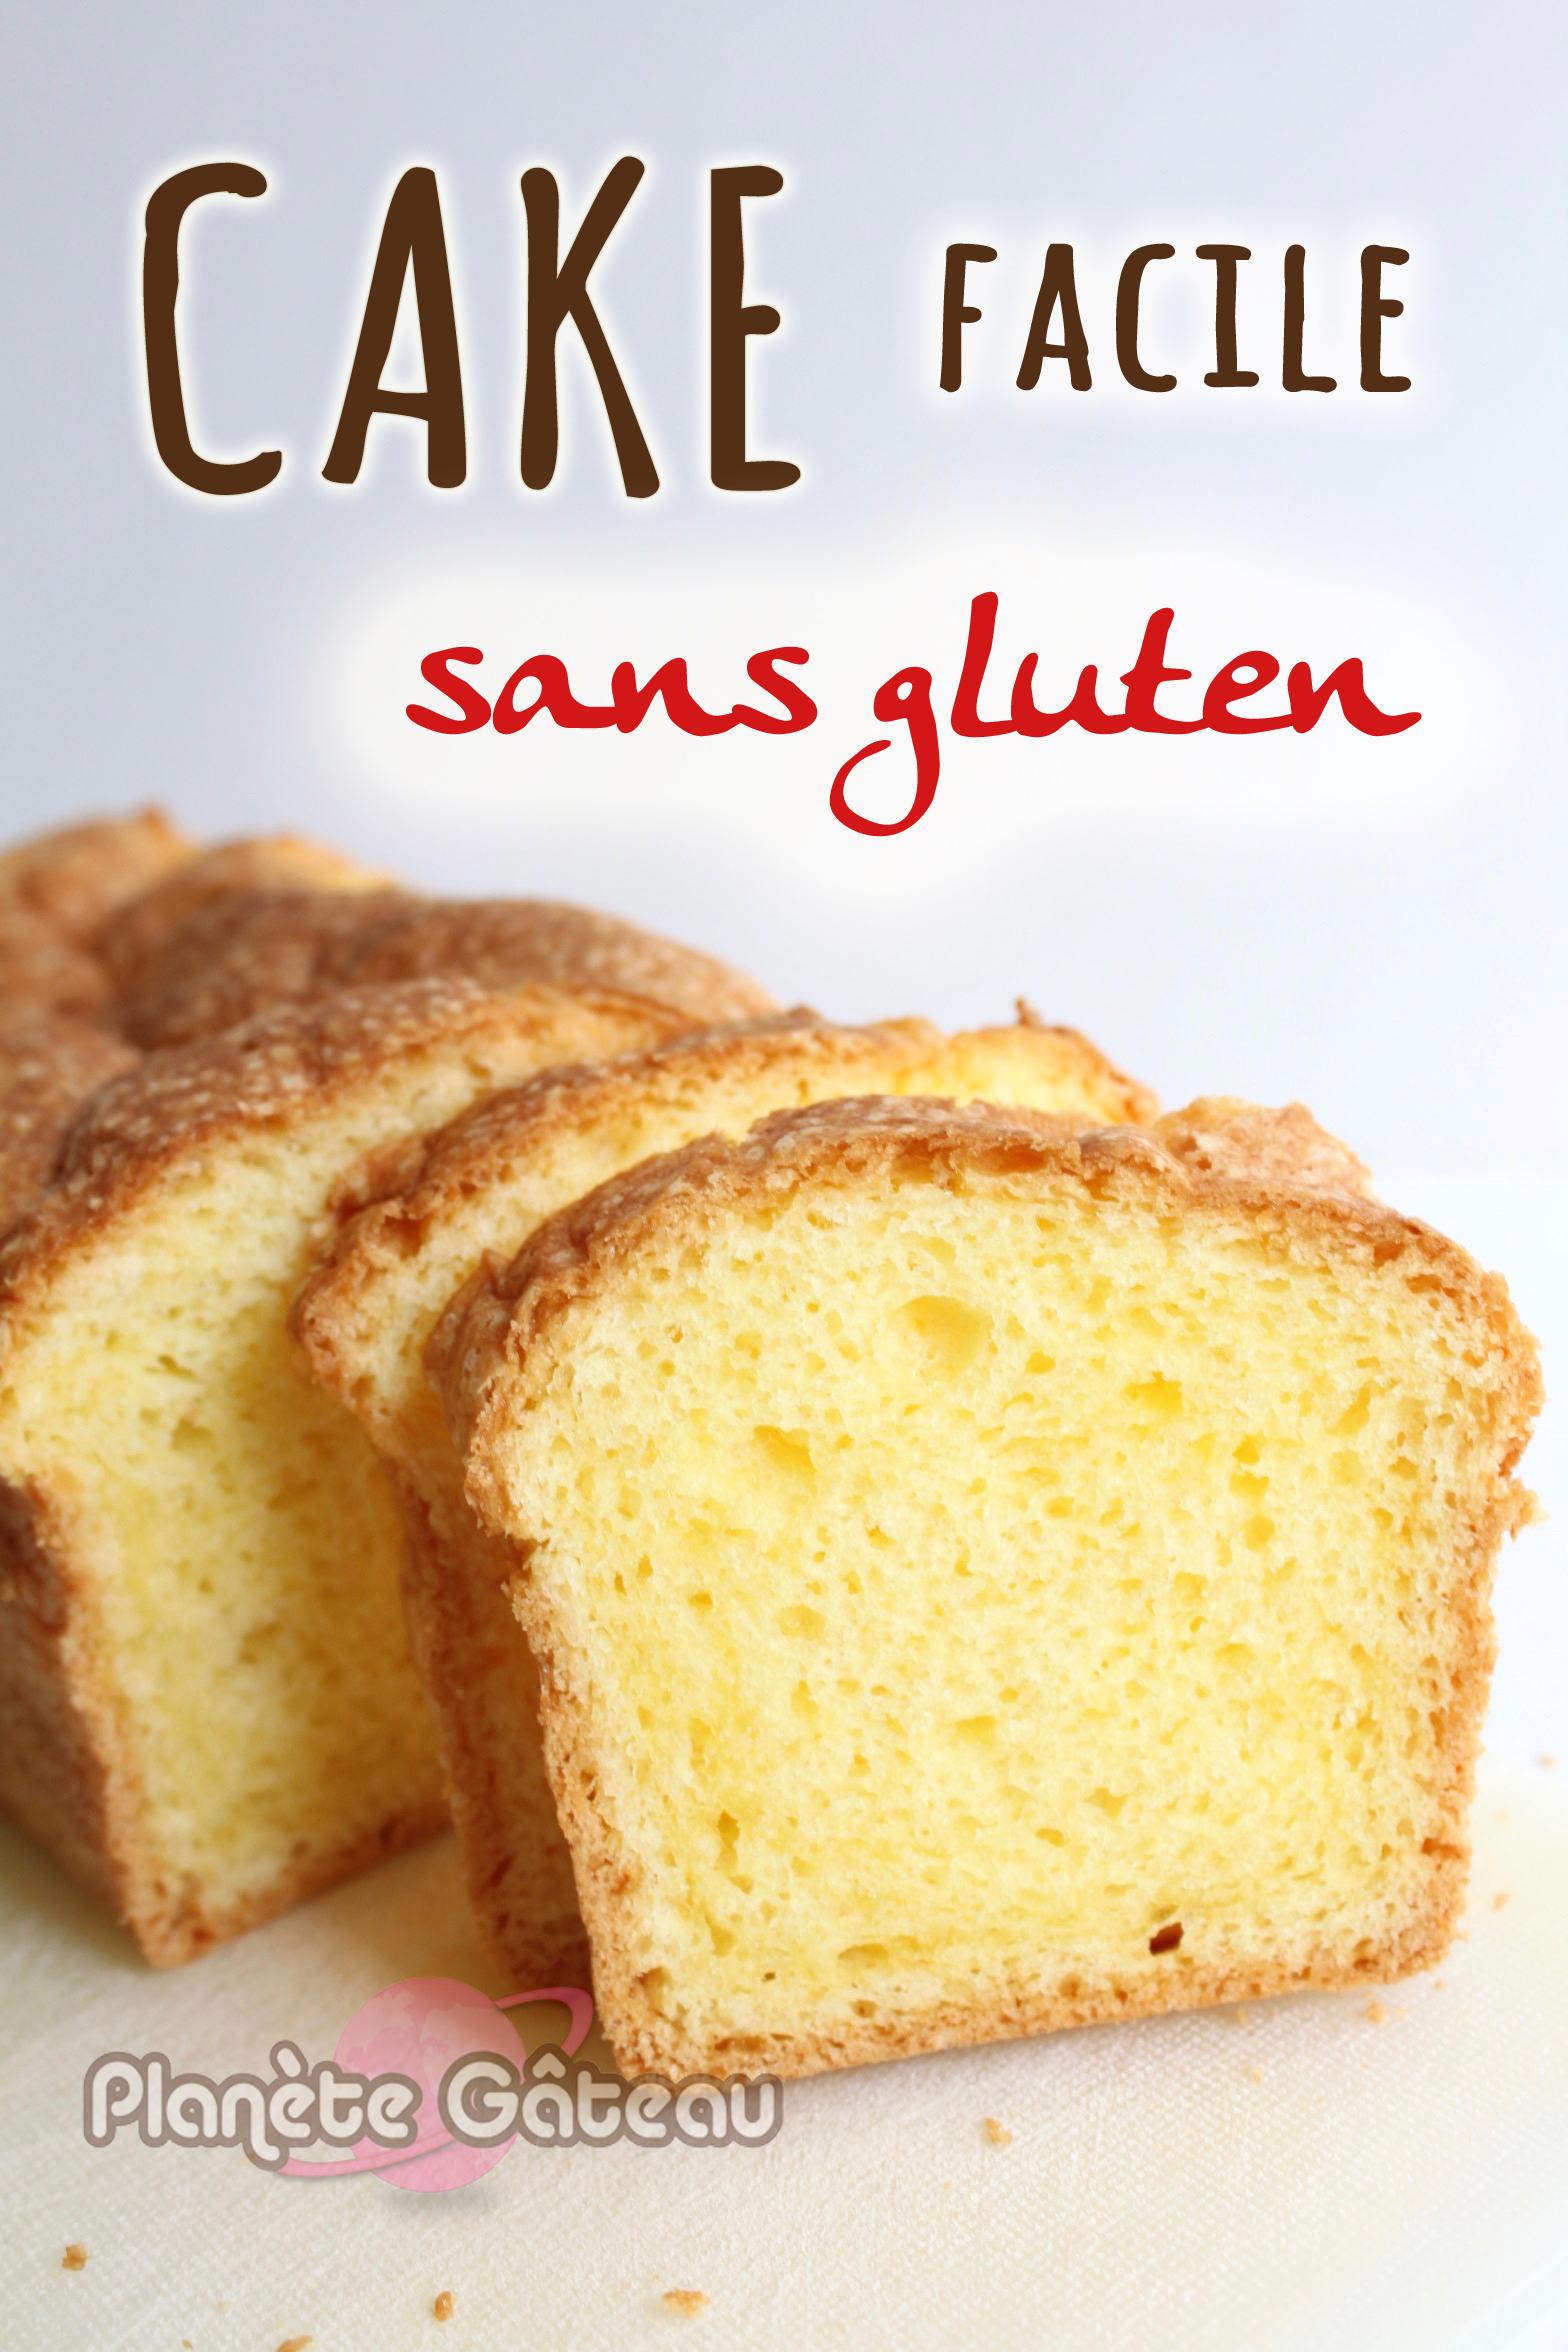 Cake facile sans gluten